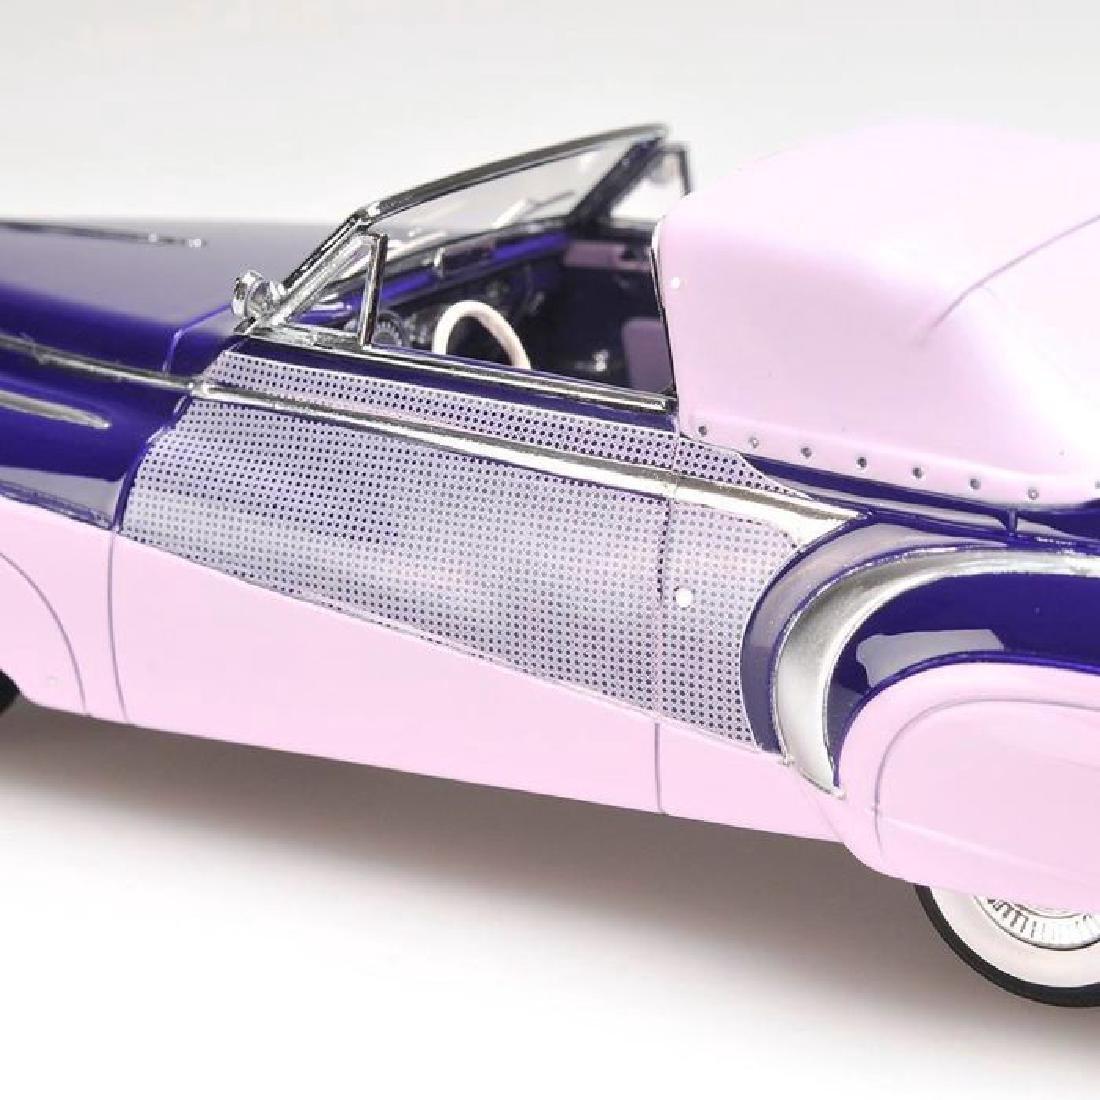 Minichamps Scale 1:43 Cadillac Series 62 Saoutchik - 5